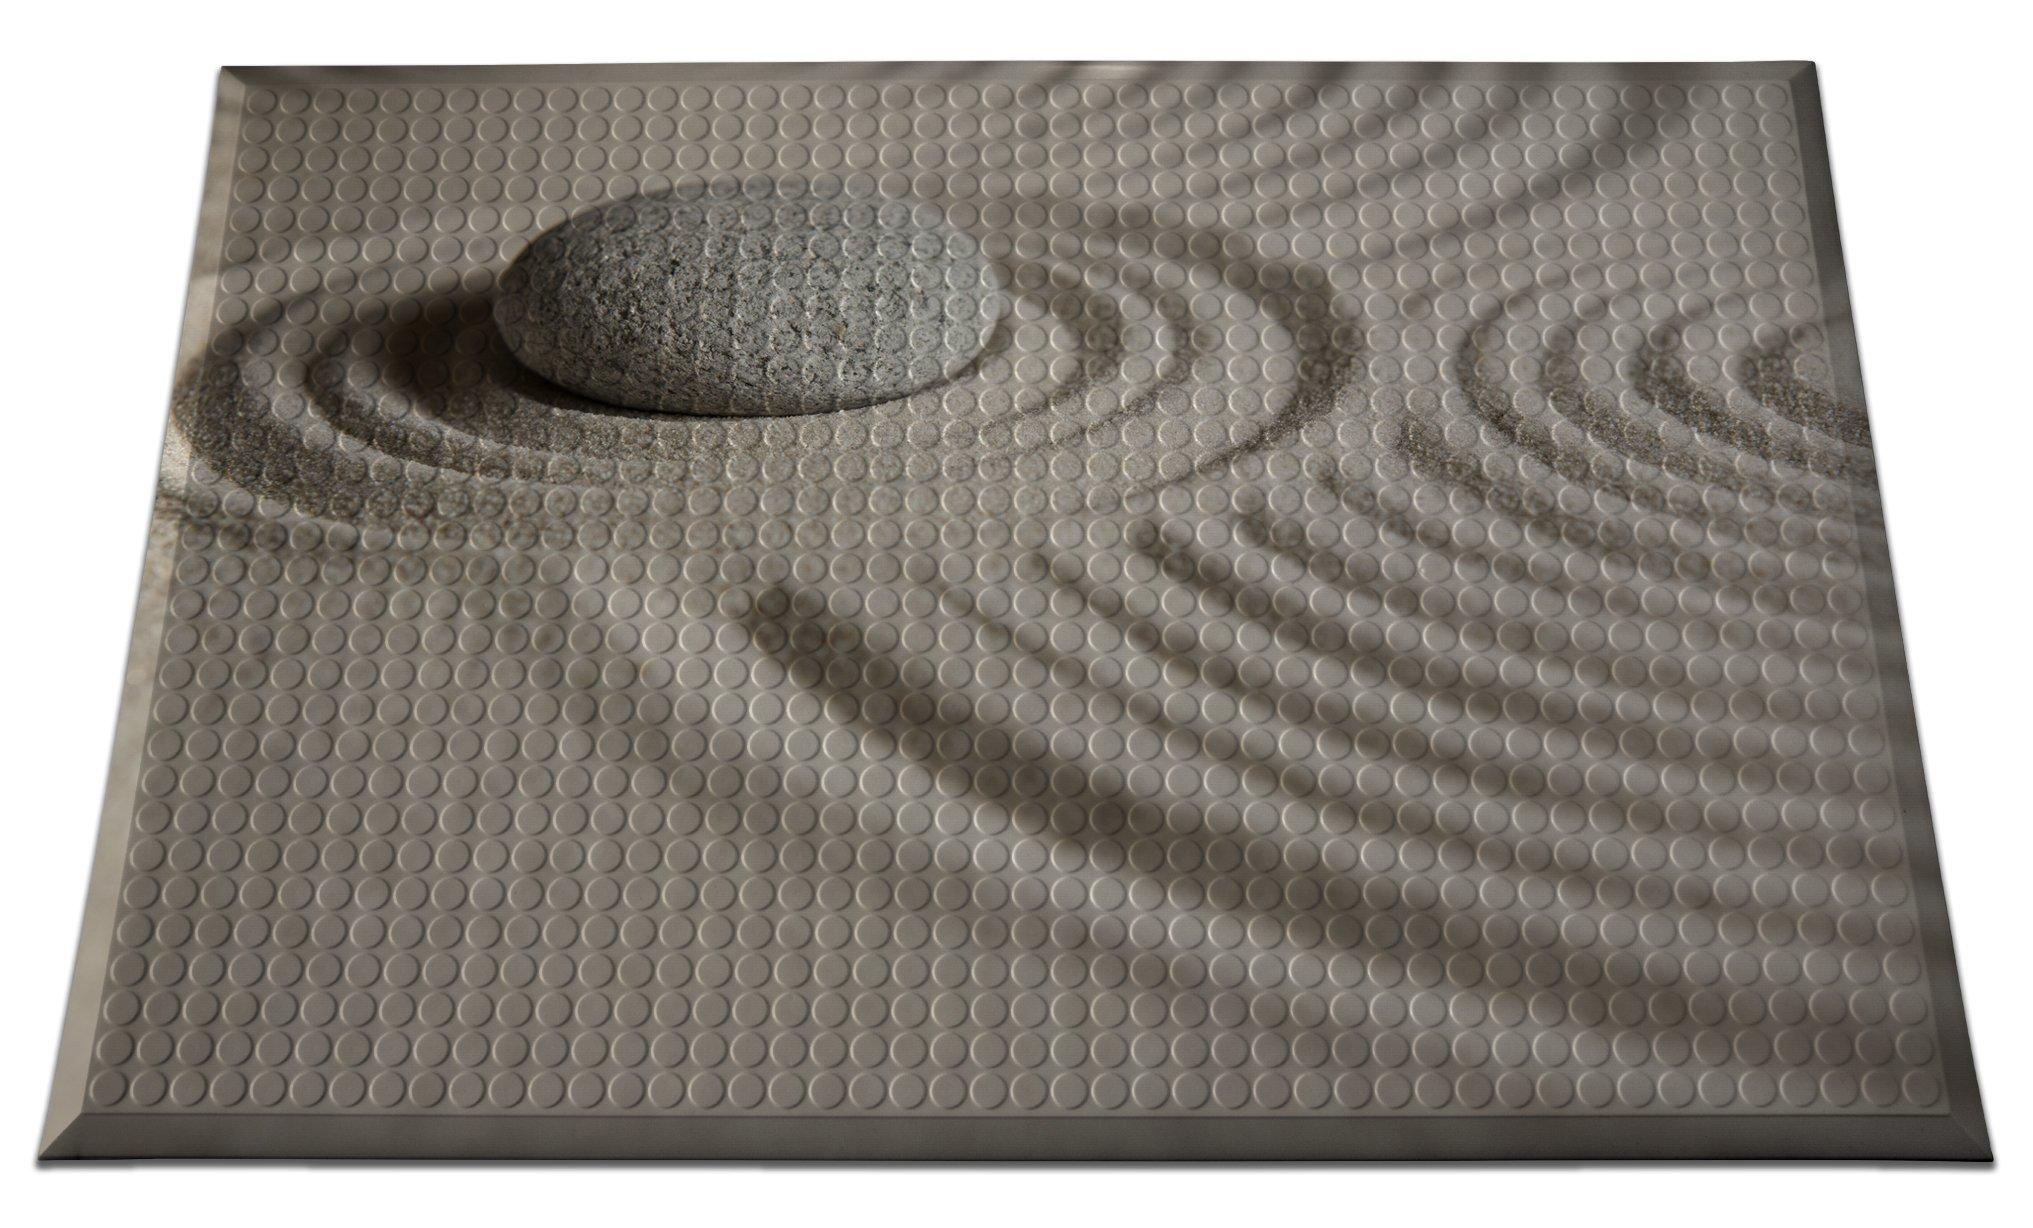 Ergomat INS-0203-06 Home Edition Anti-Fatigue Graphic Floor Mats, Zen Sand Smooth, 2' x 3' by Ergomat